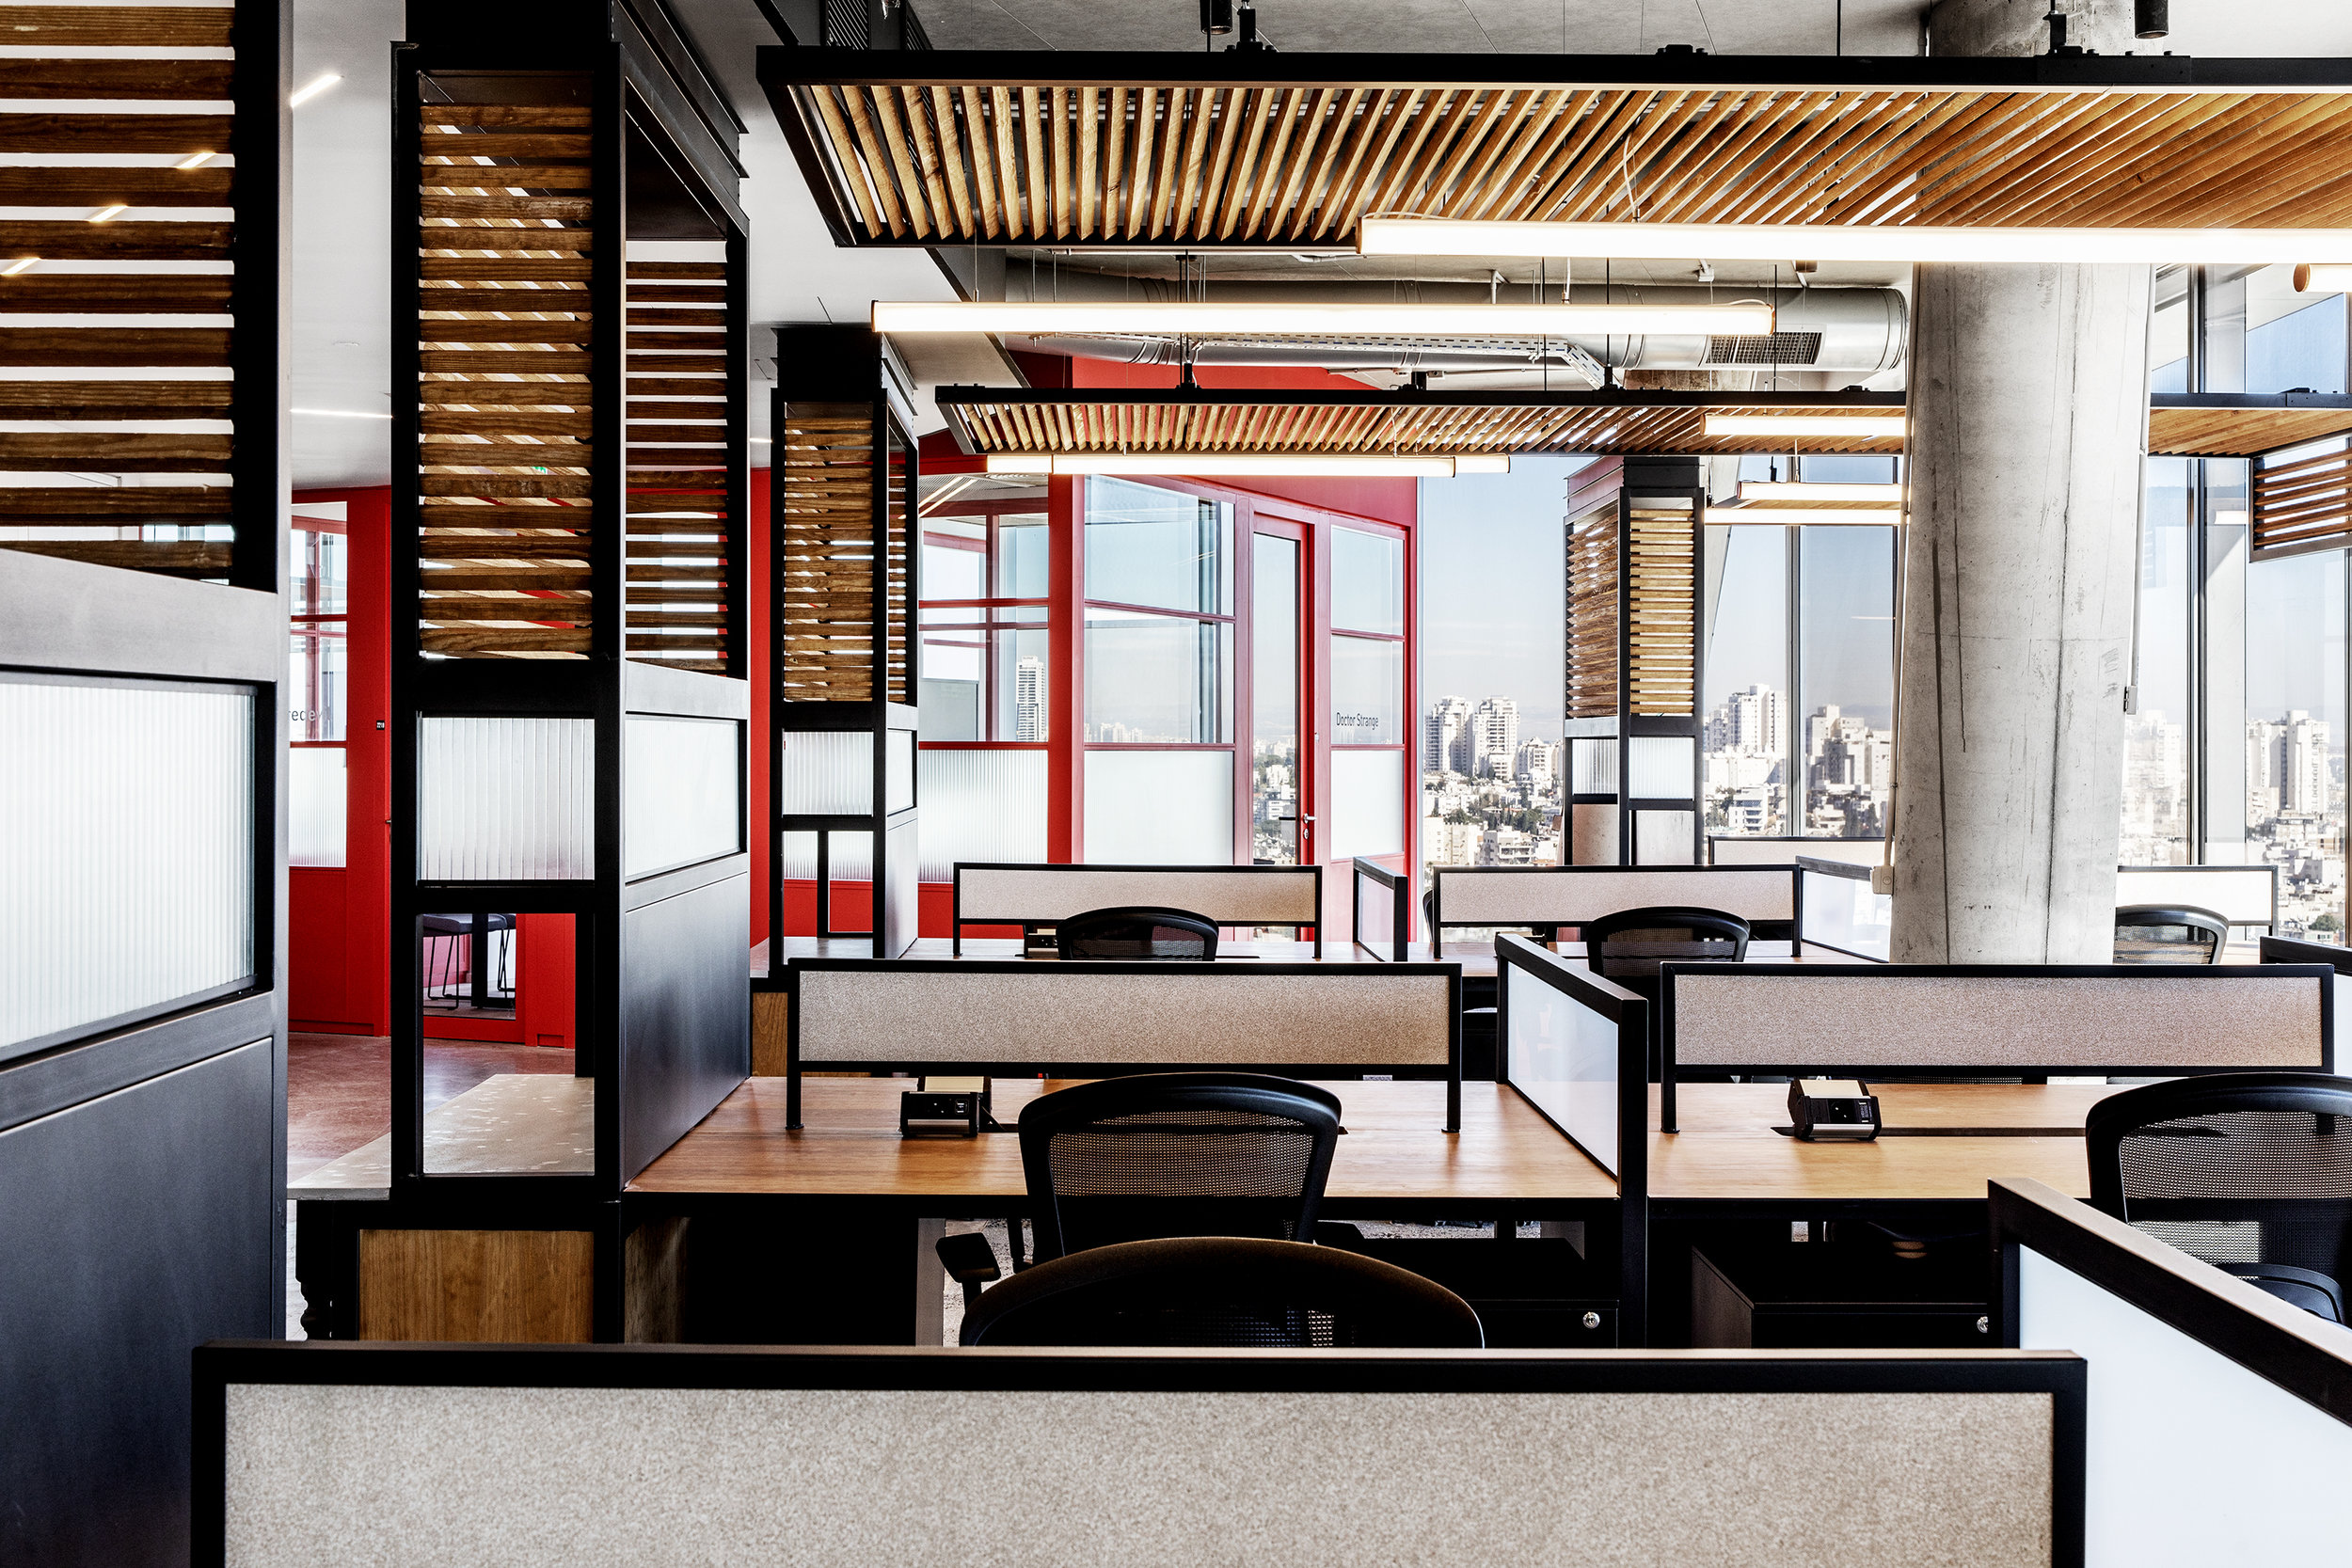 רואי דוד אדריכלות - אדריכל - נטורל אינטליג'נס - ROY DAVID - ARCHITECTURE - ARCHITECT - NI (86).jpg